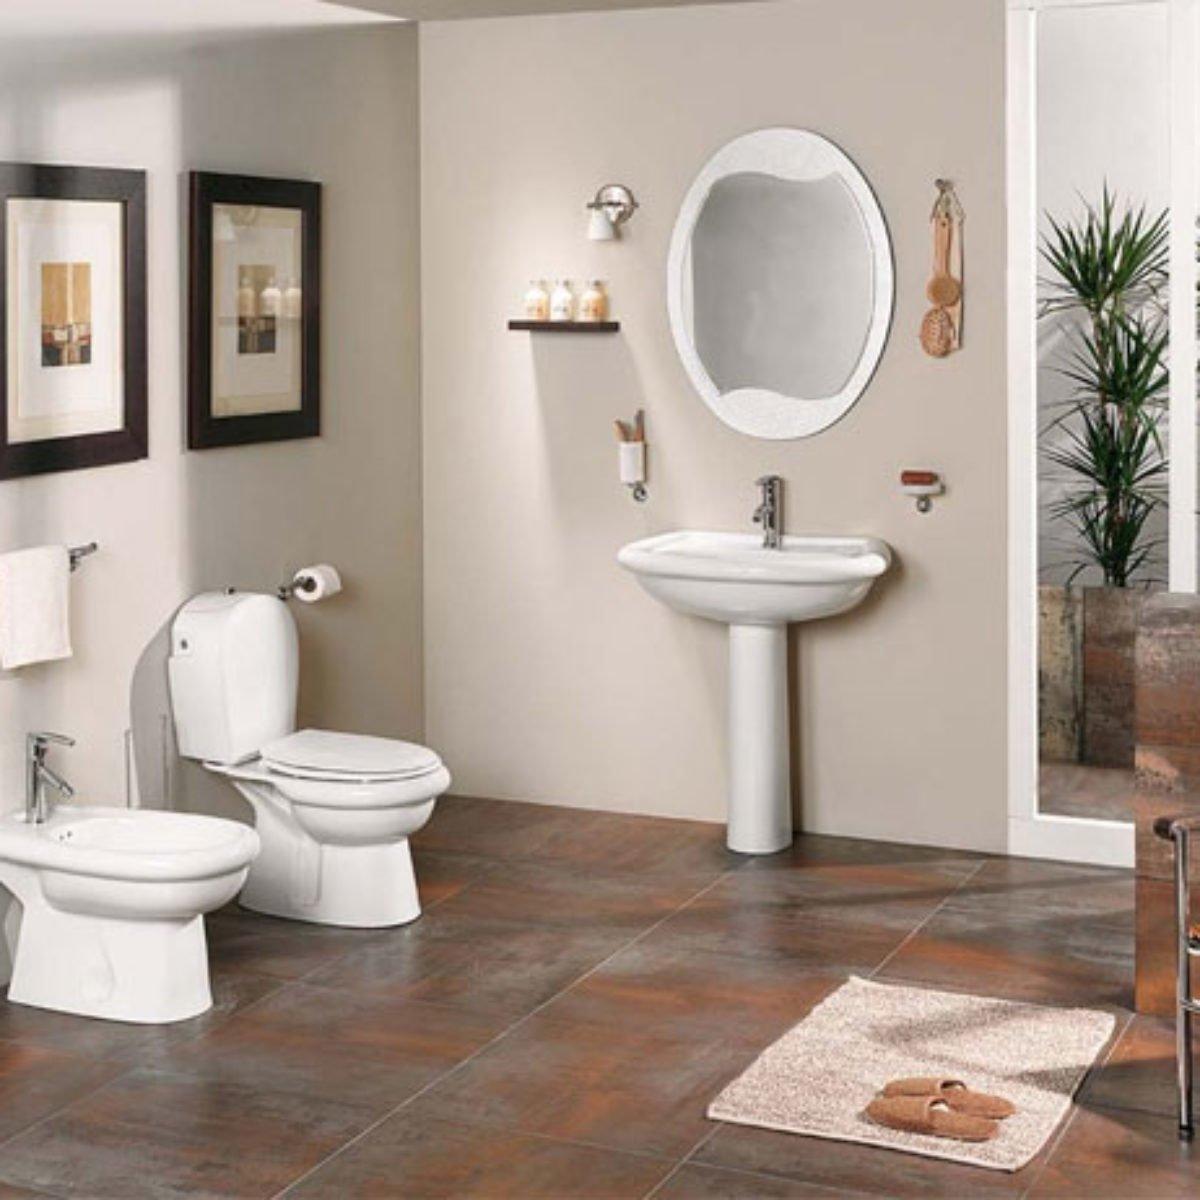 Bathroom Renovation Service Section Image